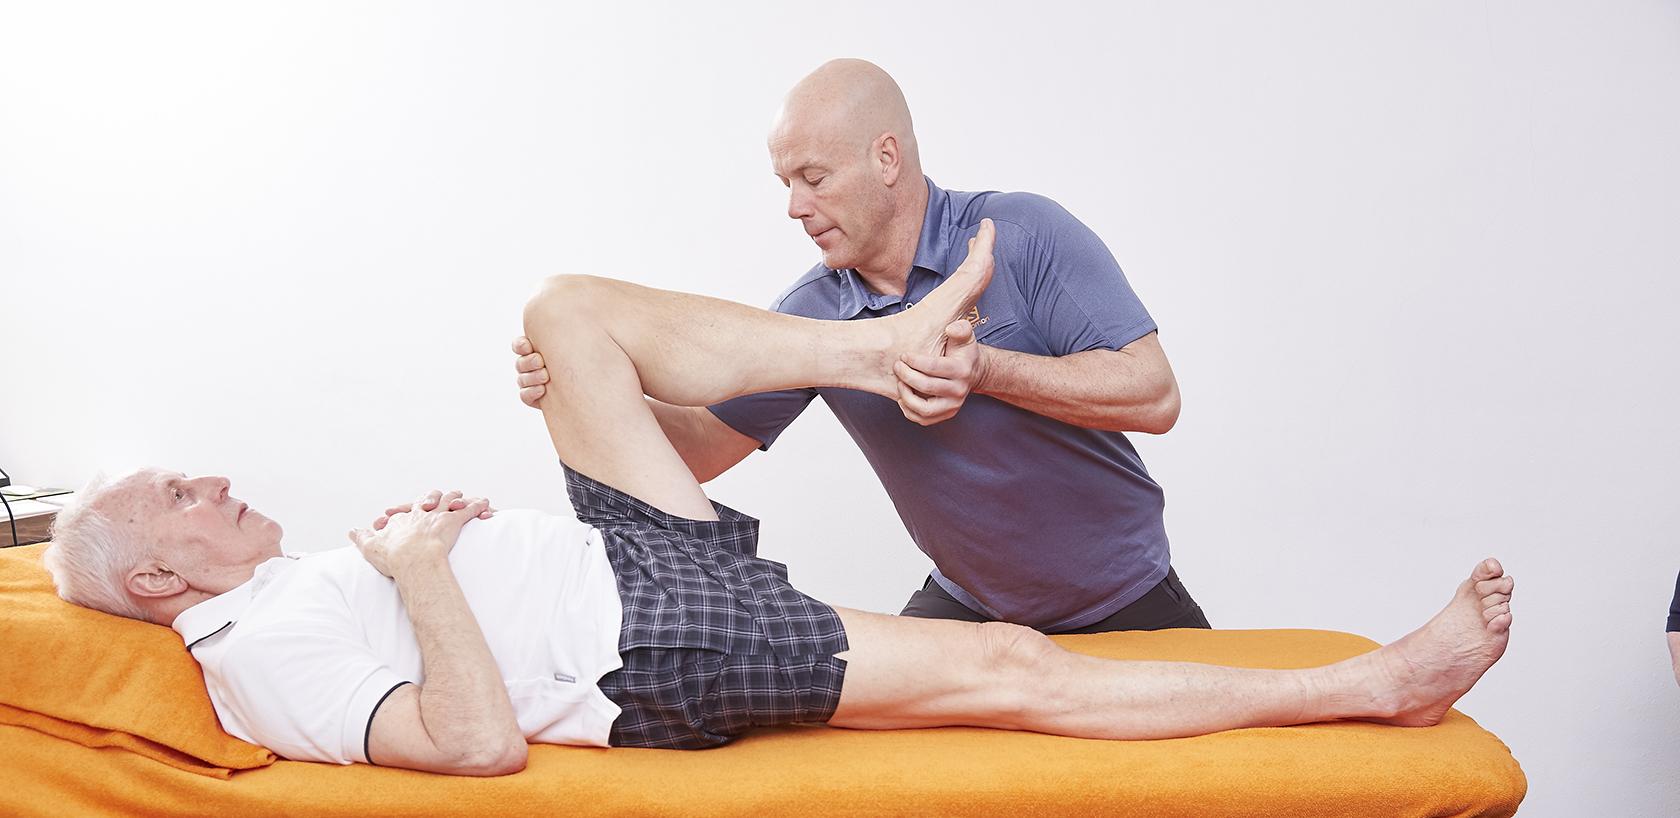 Fysiotherapie | Fysio Ysveld